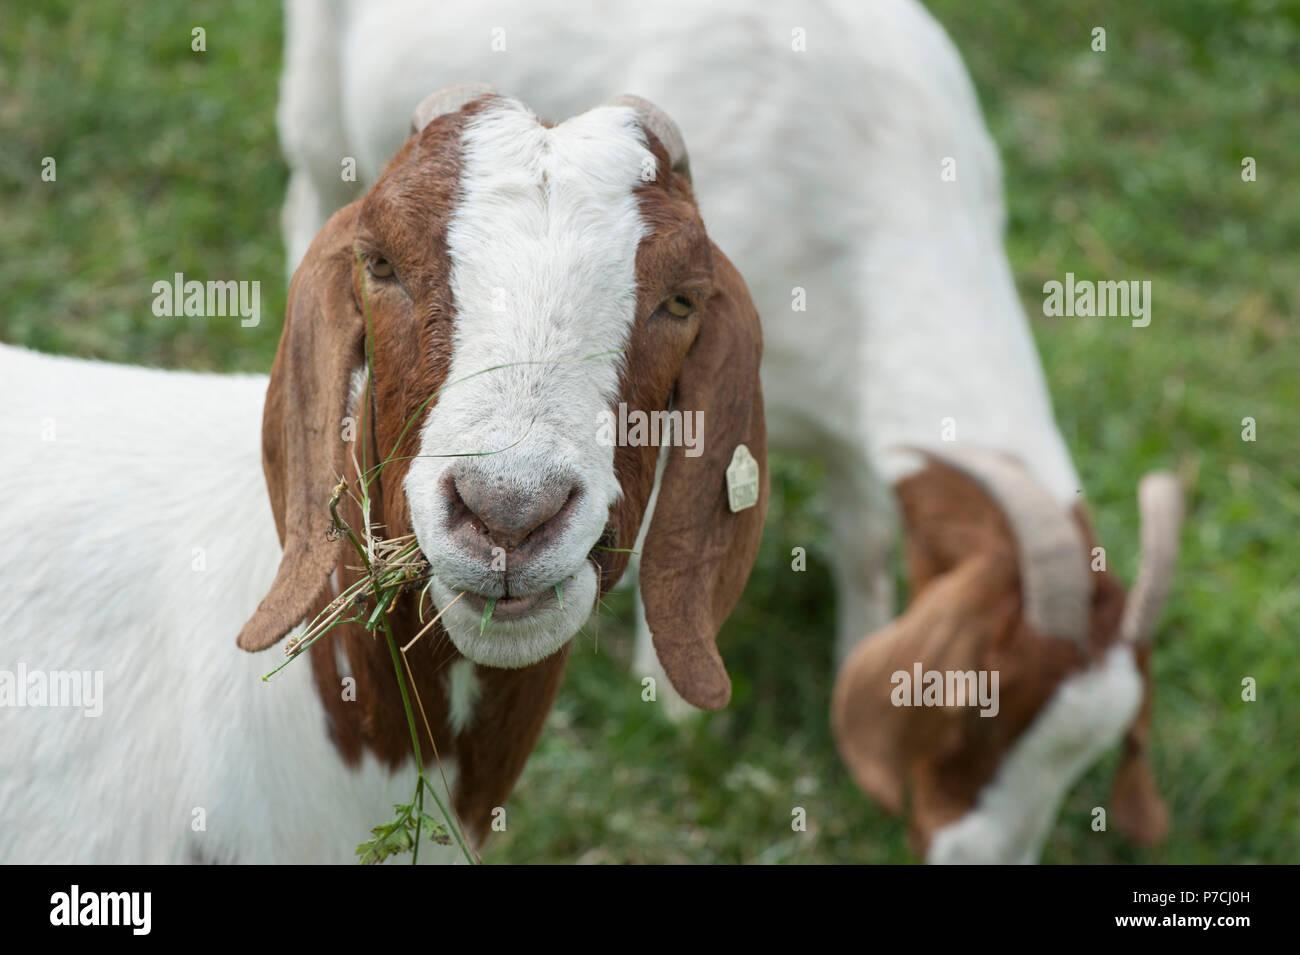 Boer goat, Hohenlohe region, Baden-Wuerttemberg, Germany - Stock Image